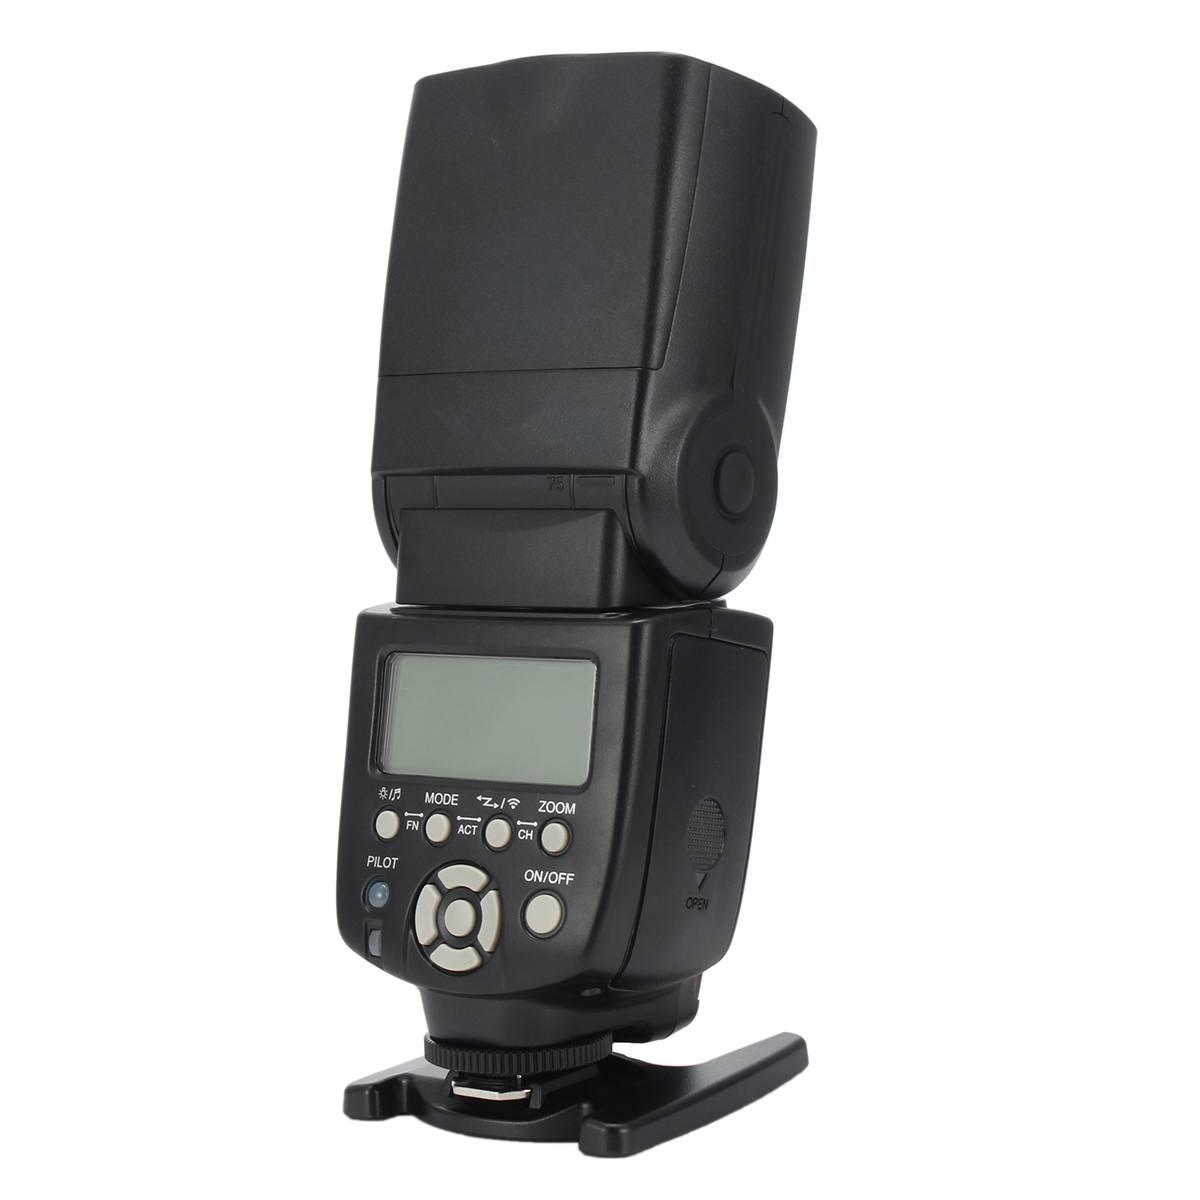 Pro Wireless Flash Speedlite Speedlight For Canon Nikon  Olympus SLR Camera Panasonic Pentax Camera With High Speed SyncPro Wireless Flash Speedlite Speedlight For Canon Nikon  Olympus SLR Camera Panasonic Pentax Camera With High Speed Sync